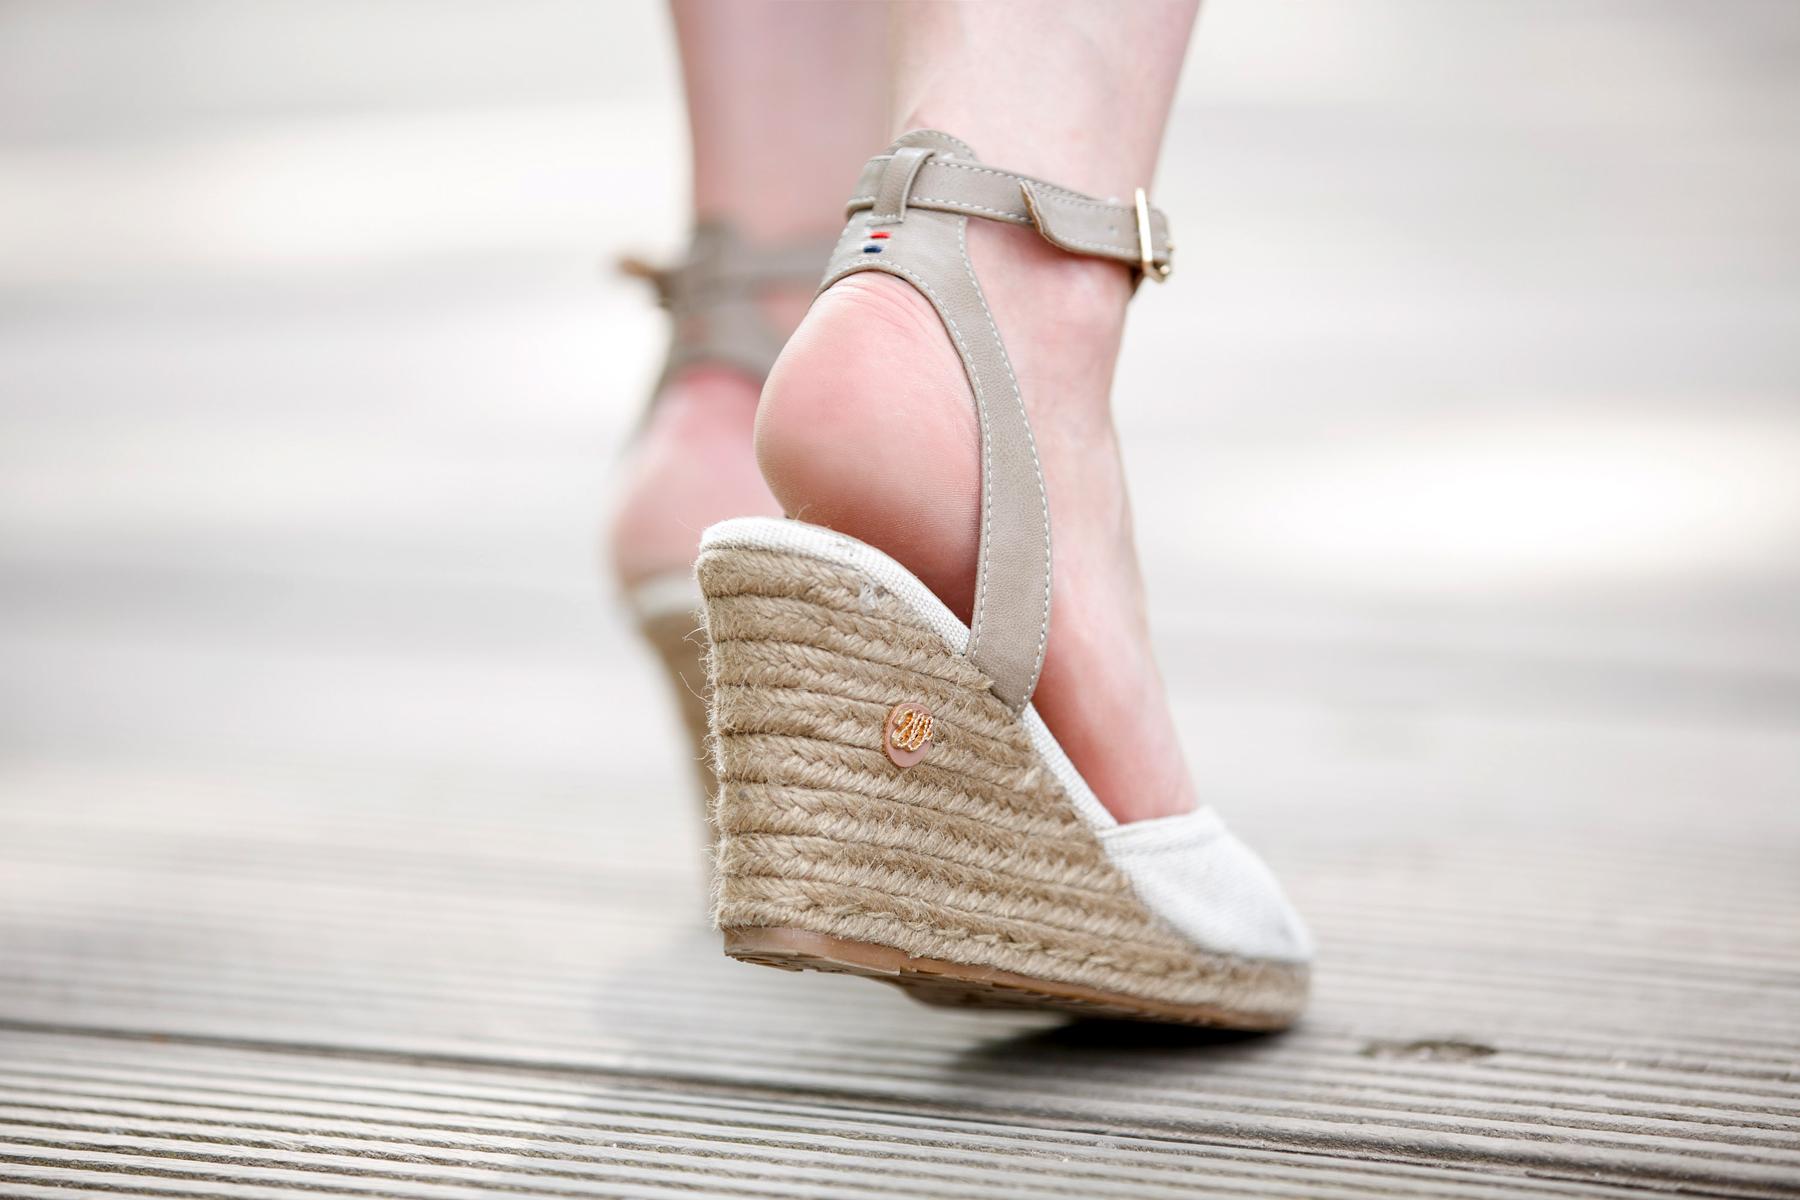 dress-for-less outfit styling white sommerkleid summer look crochet wrangler hilfiger fashion blog germany düsseldorf ricarda schernus cats & dogs 3